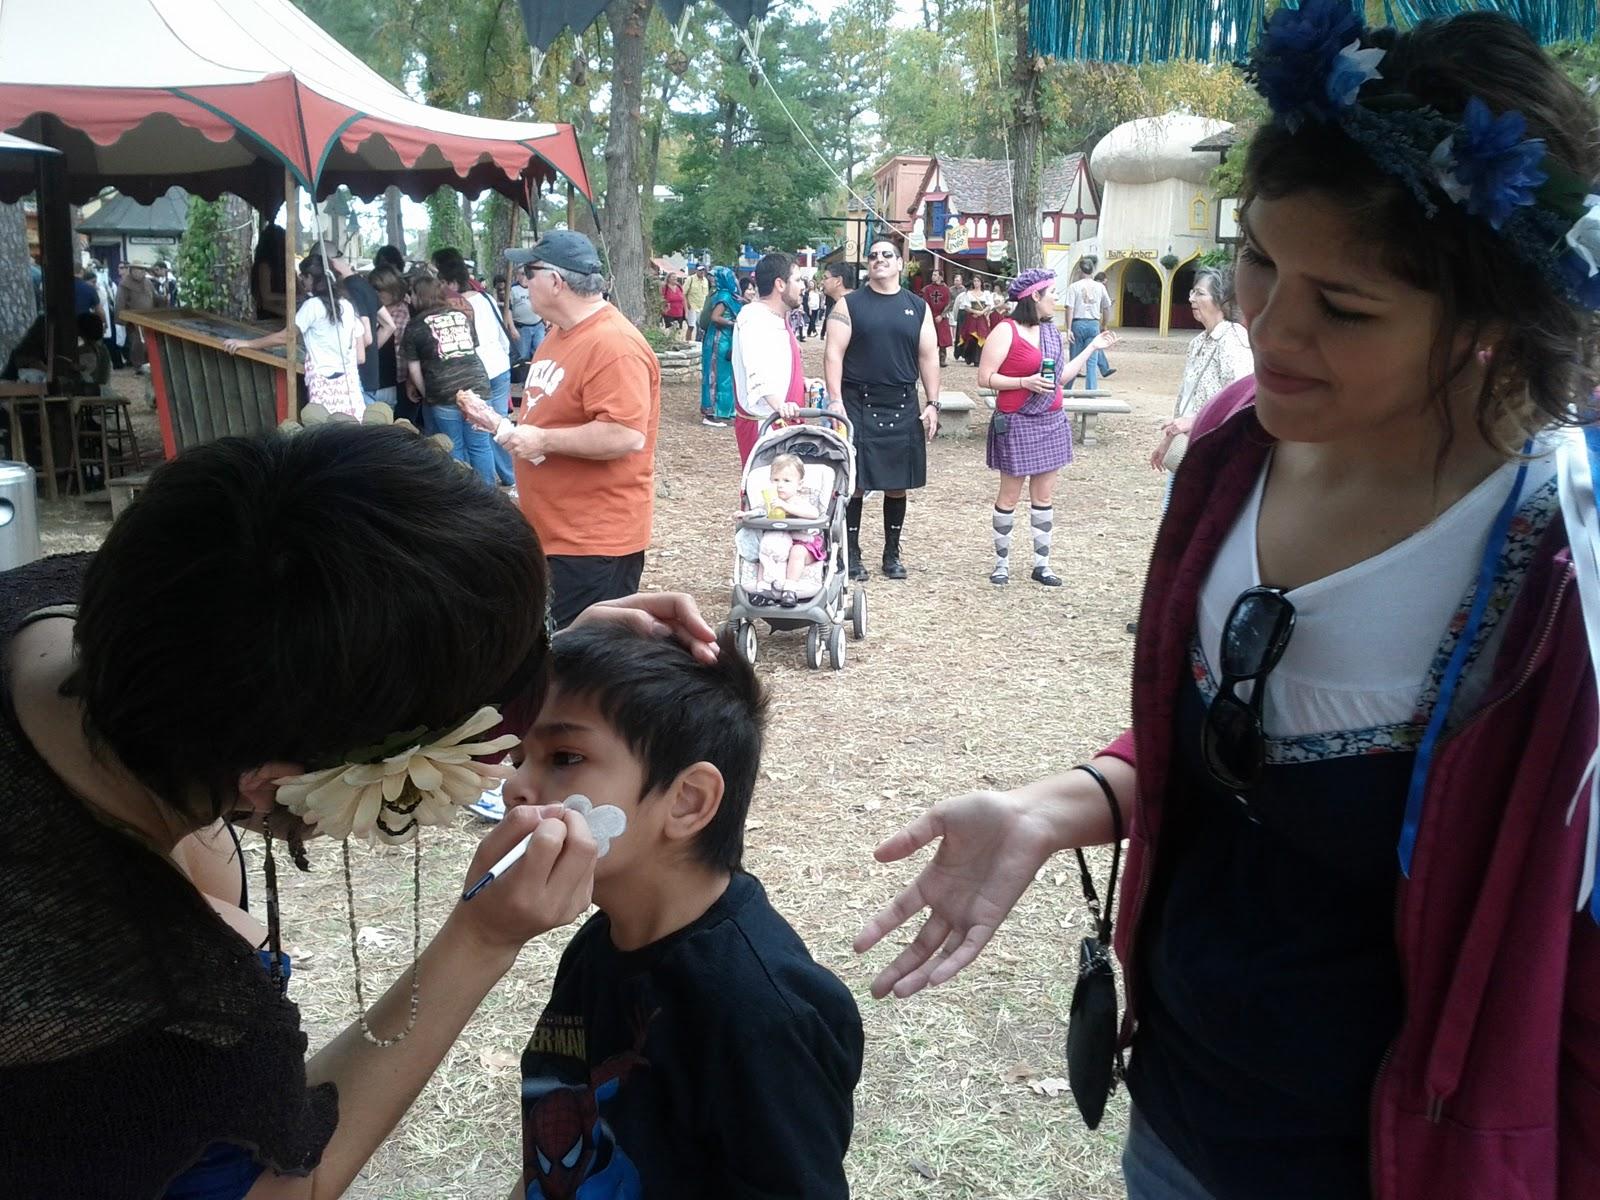 Texas Renaissance Festival 2011 - IMG_20111112_112218.jpg